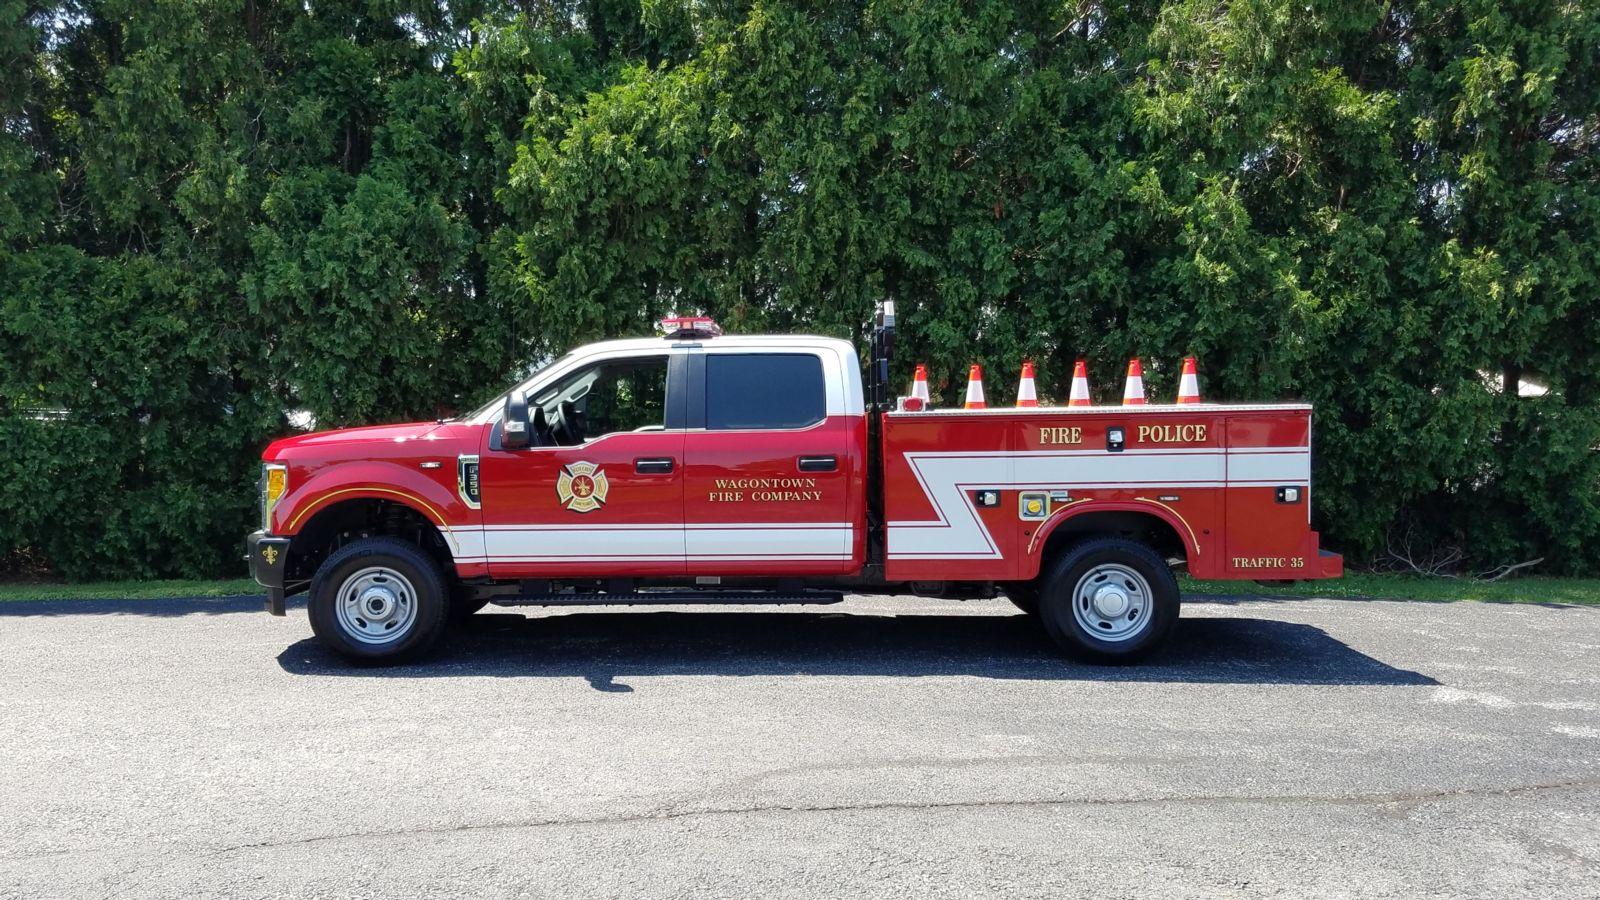 Wagontown Volunteer Fire Company PA Traffic 35 4